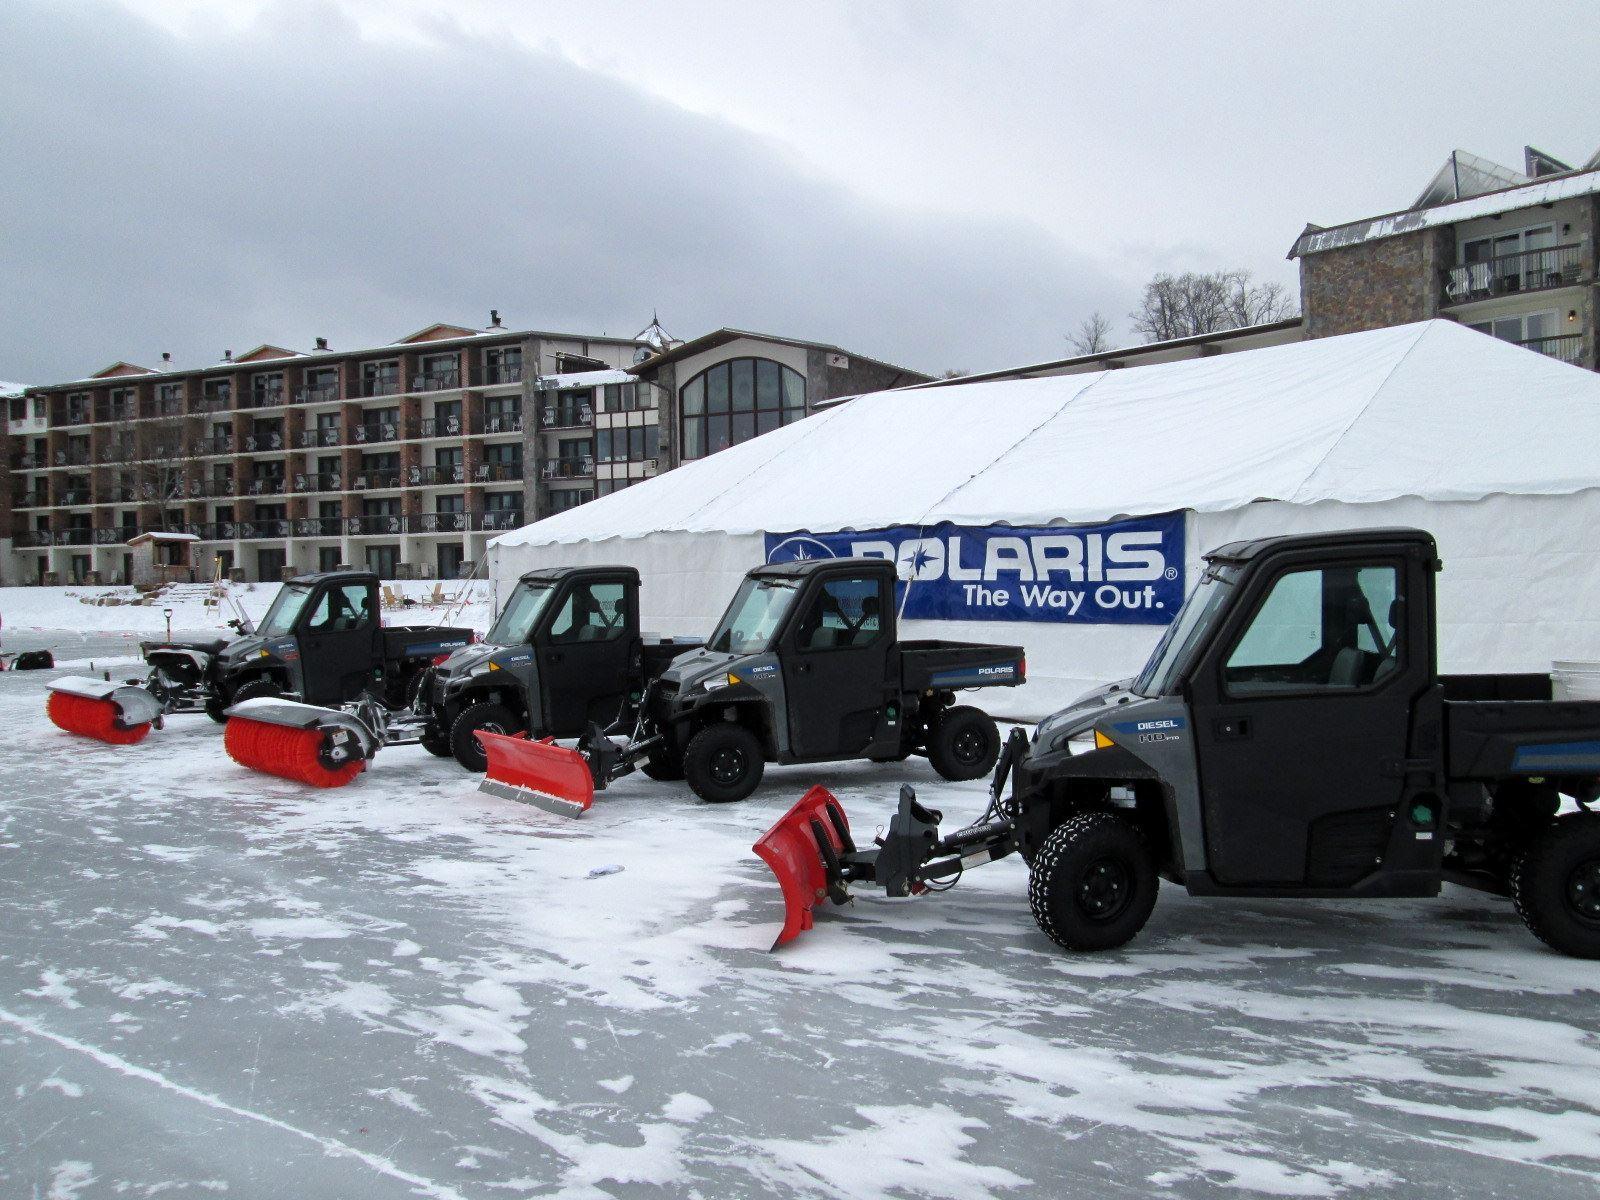 Polaris Brutus Boosts Operation Of Pond Hockey Tournament